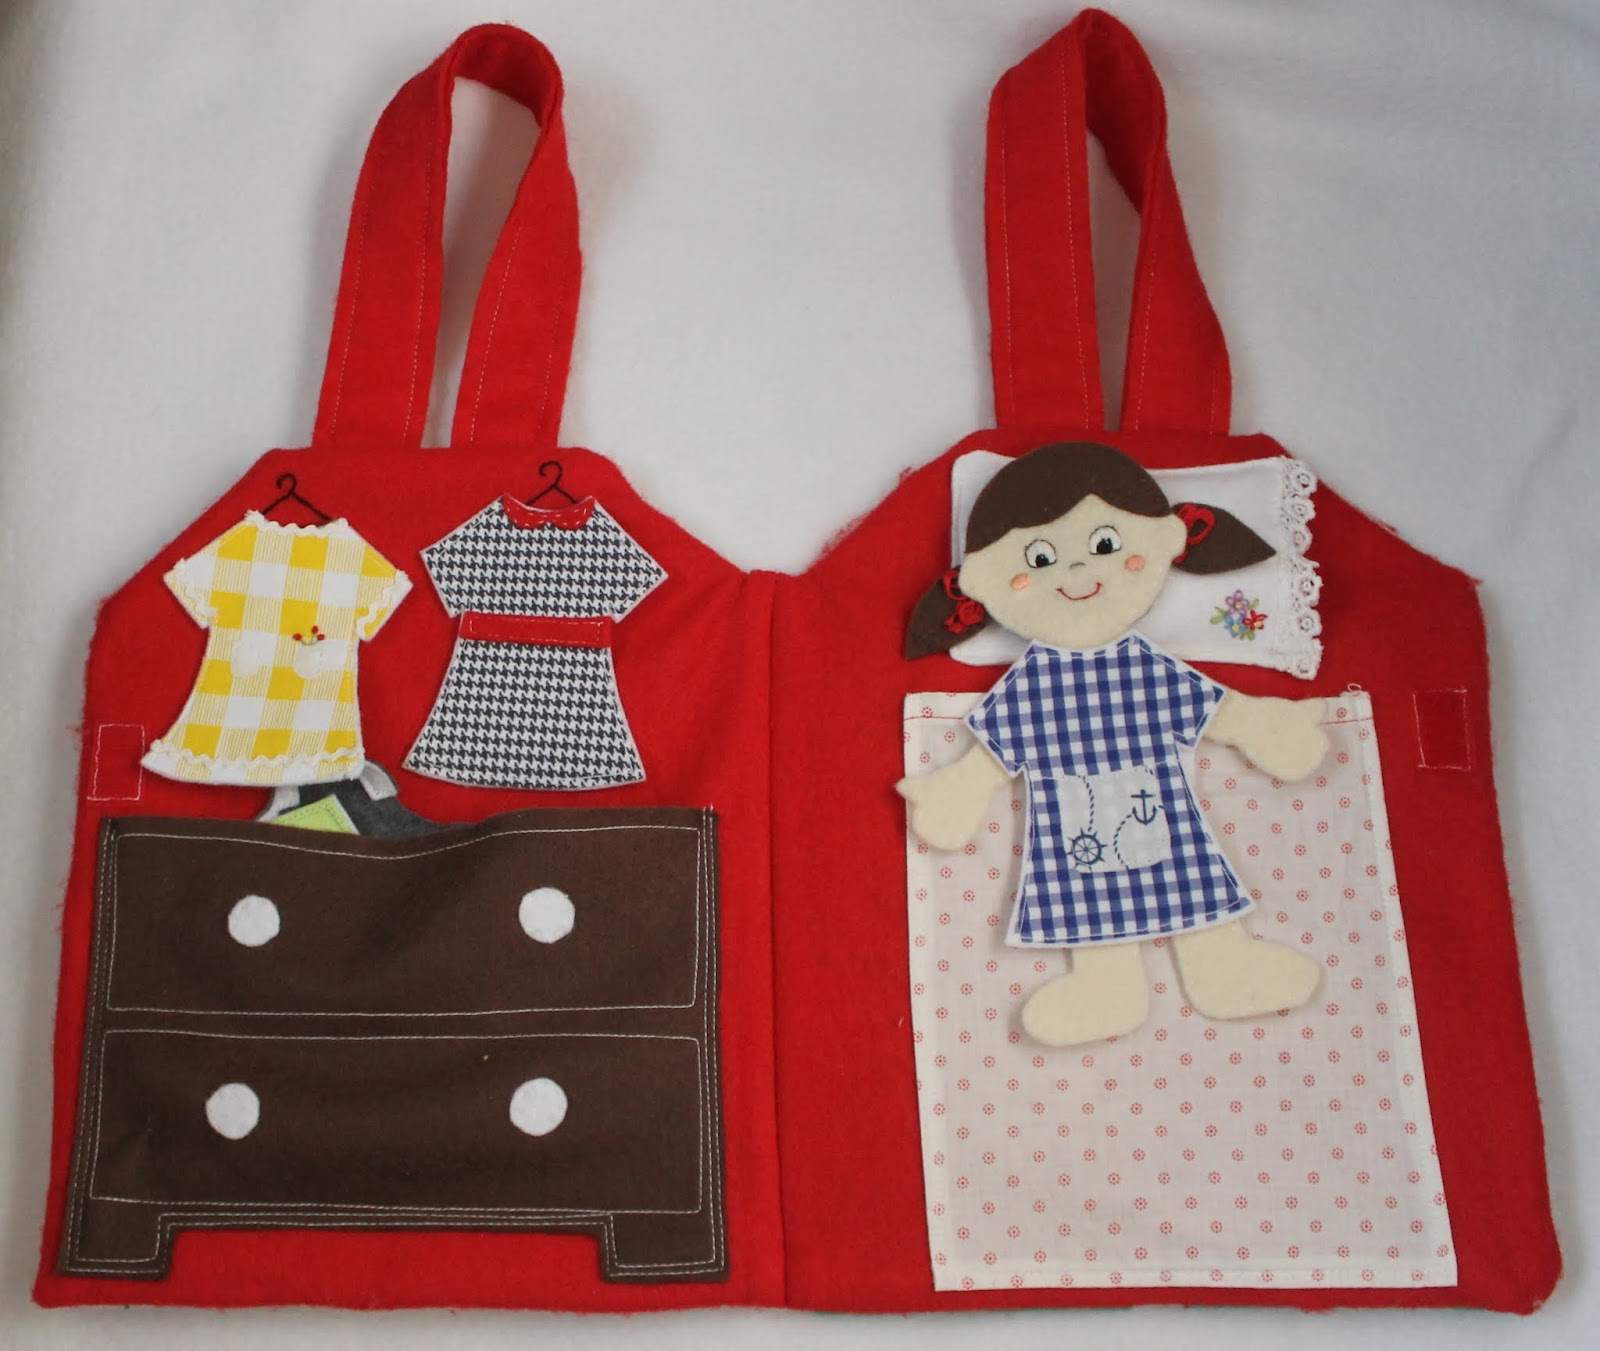 Everyday Paper Dolls - bath robe, spa day | Cricut ...  |Everyday Paper Dolls Pattern